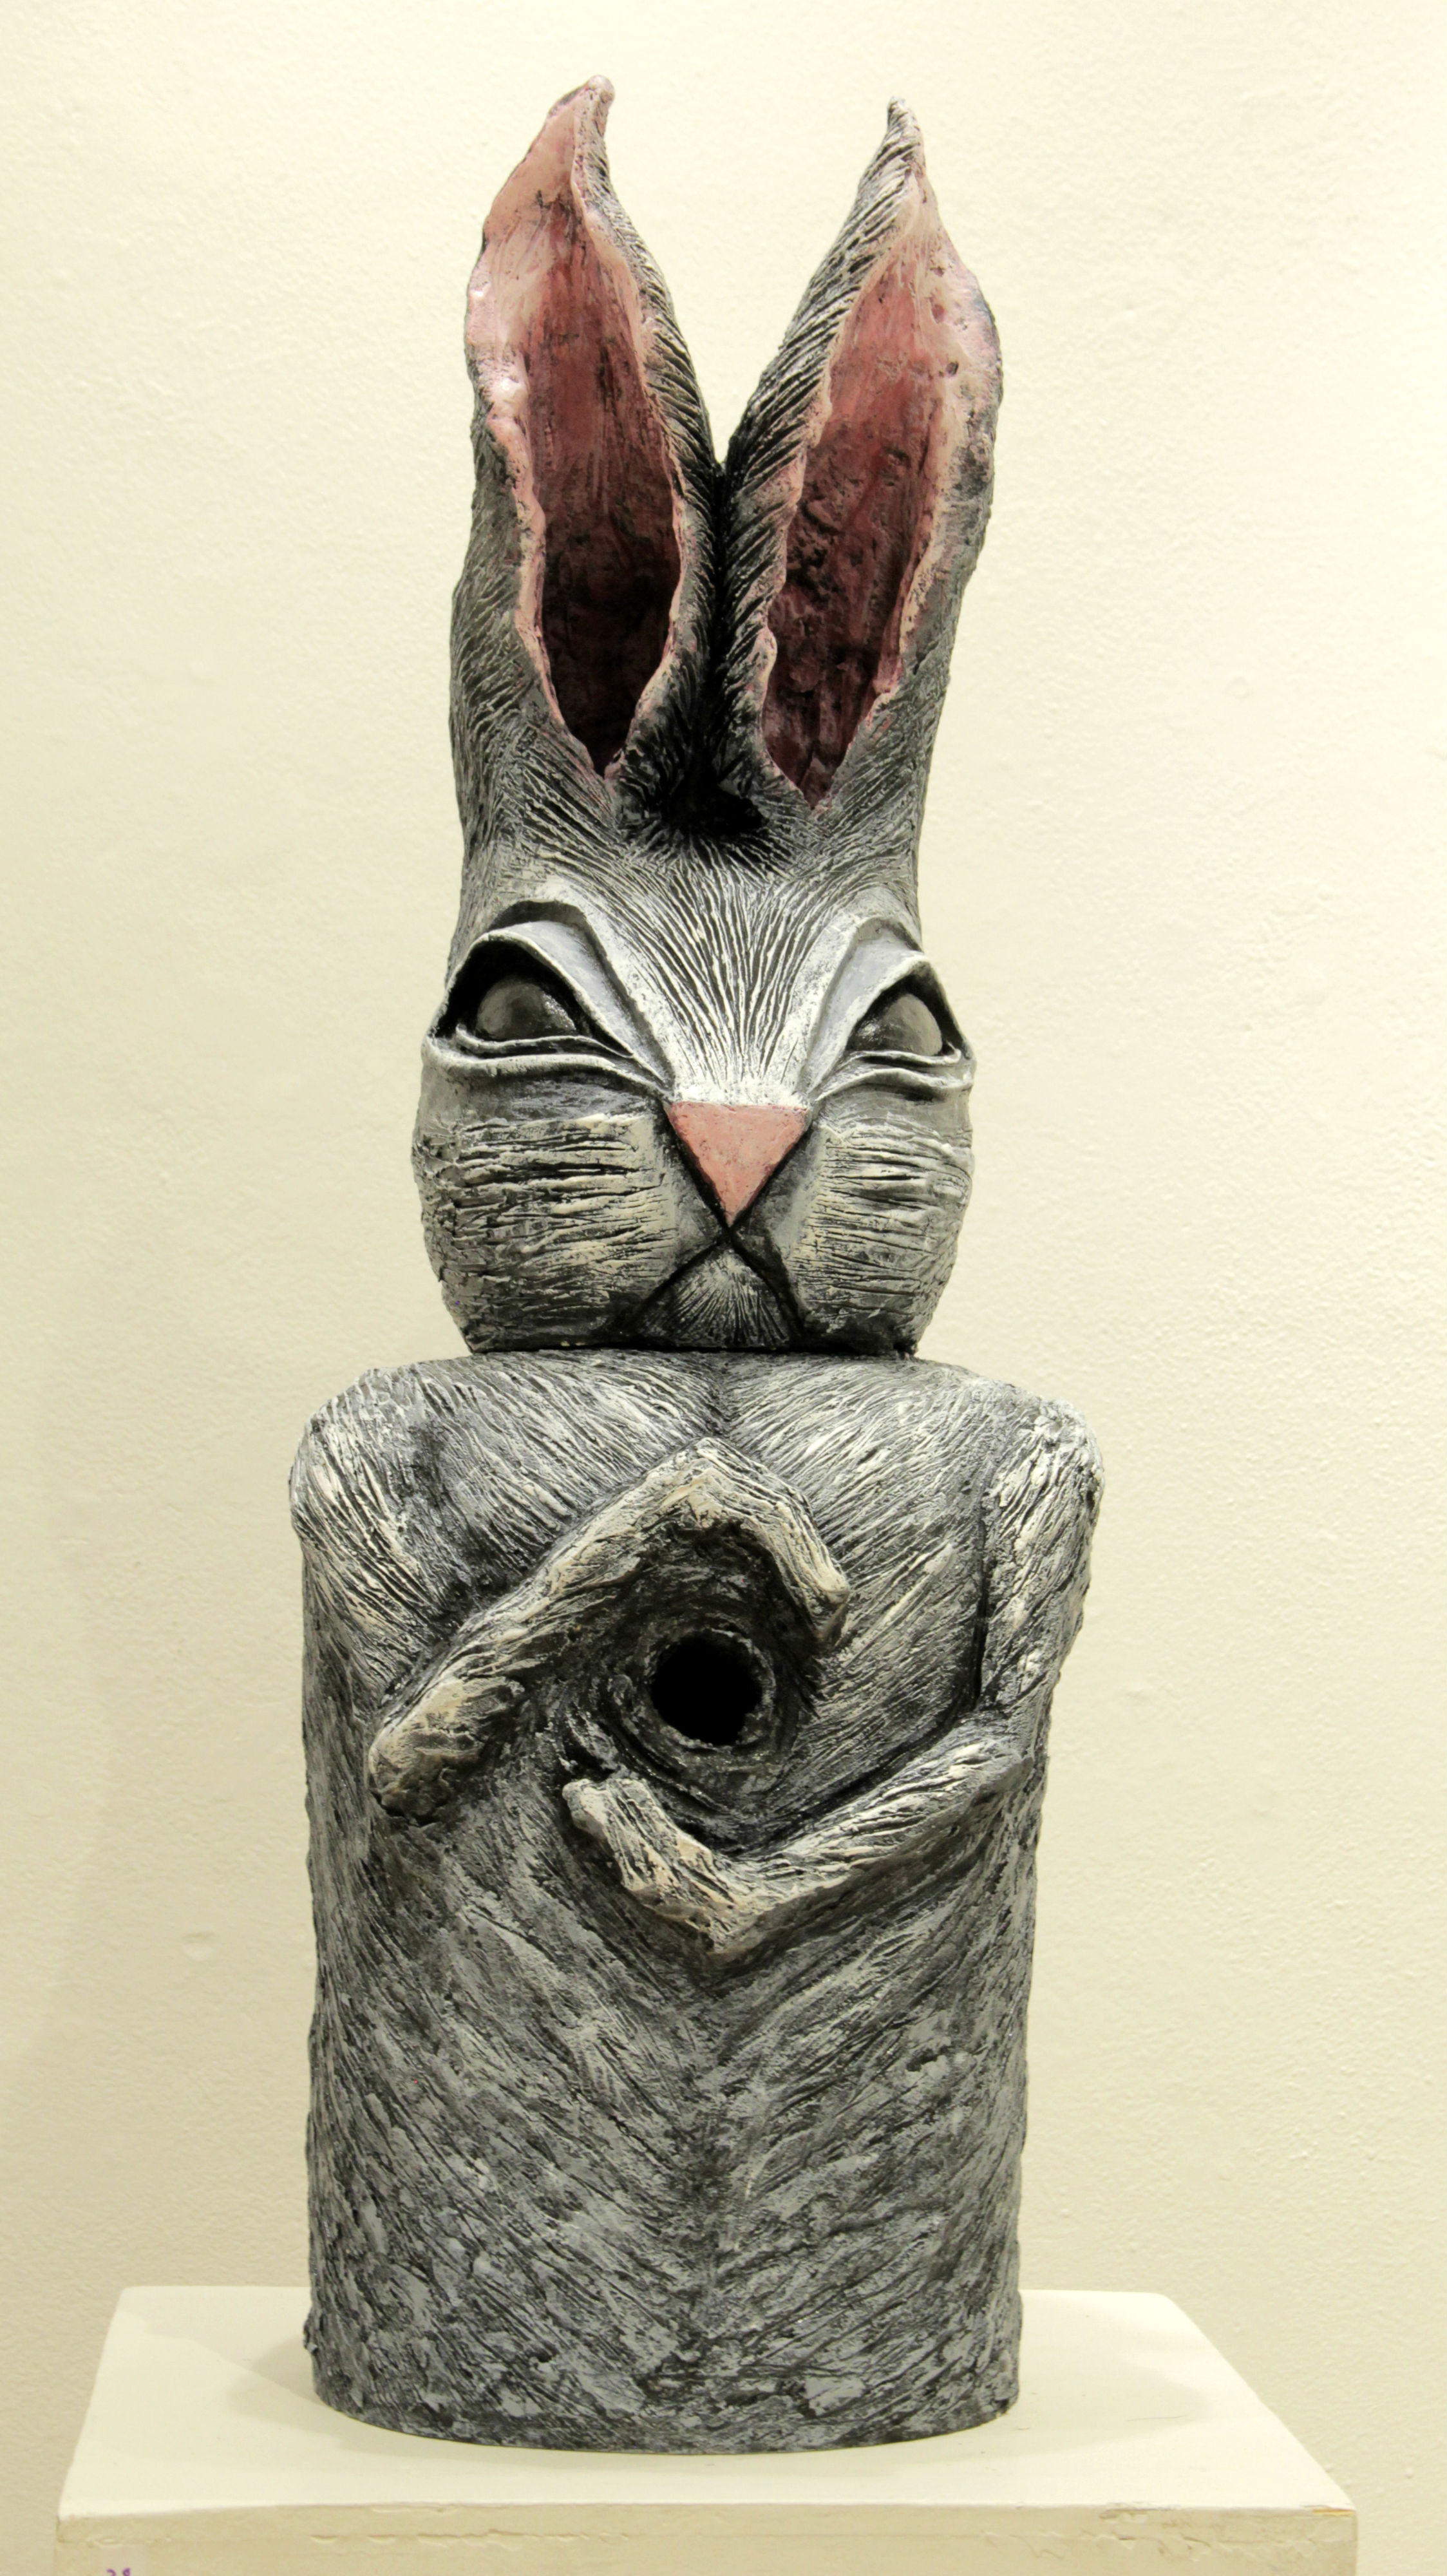 Monumental Votive Rabbit, Clay, paint, H 36 in. x W 14 in. x D 16 in.